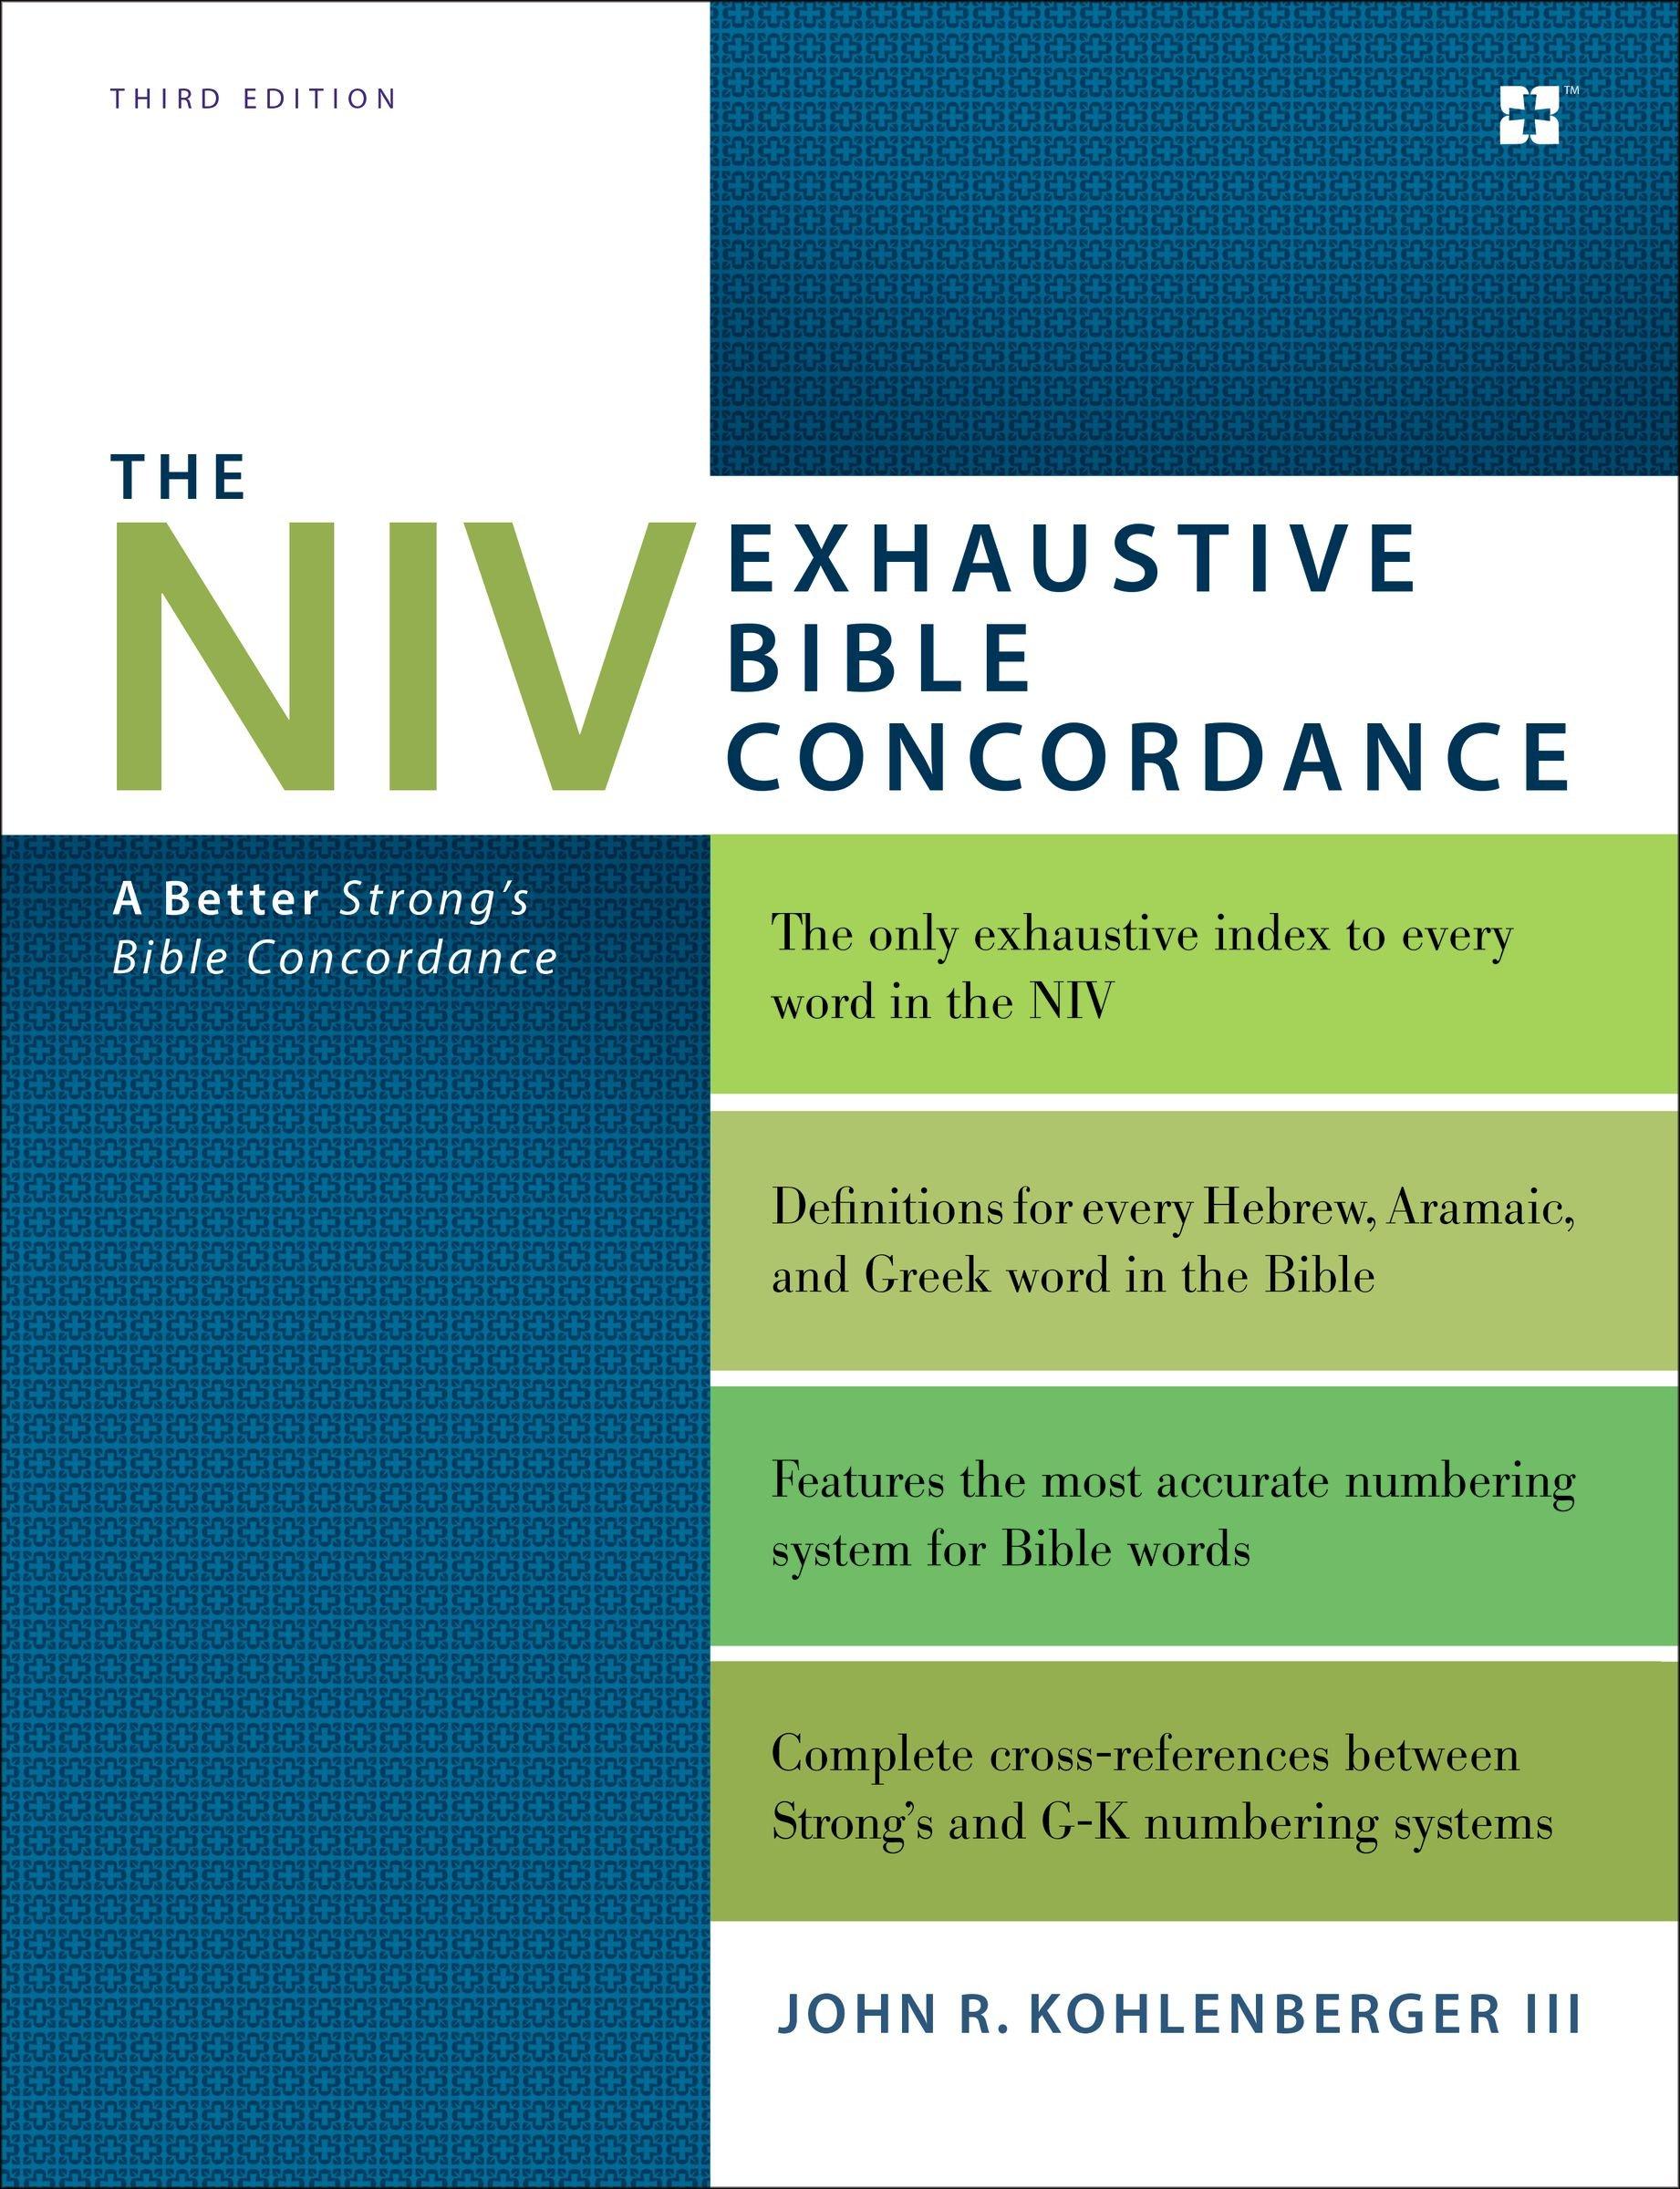 NIV Exhaustive Bible Concordance Third